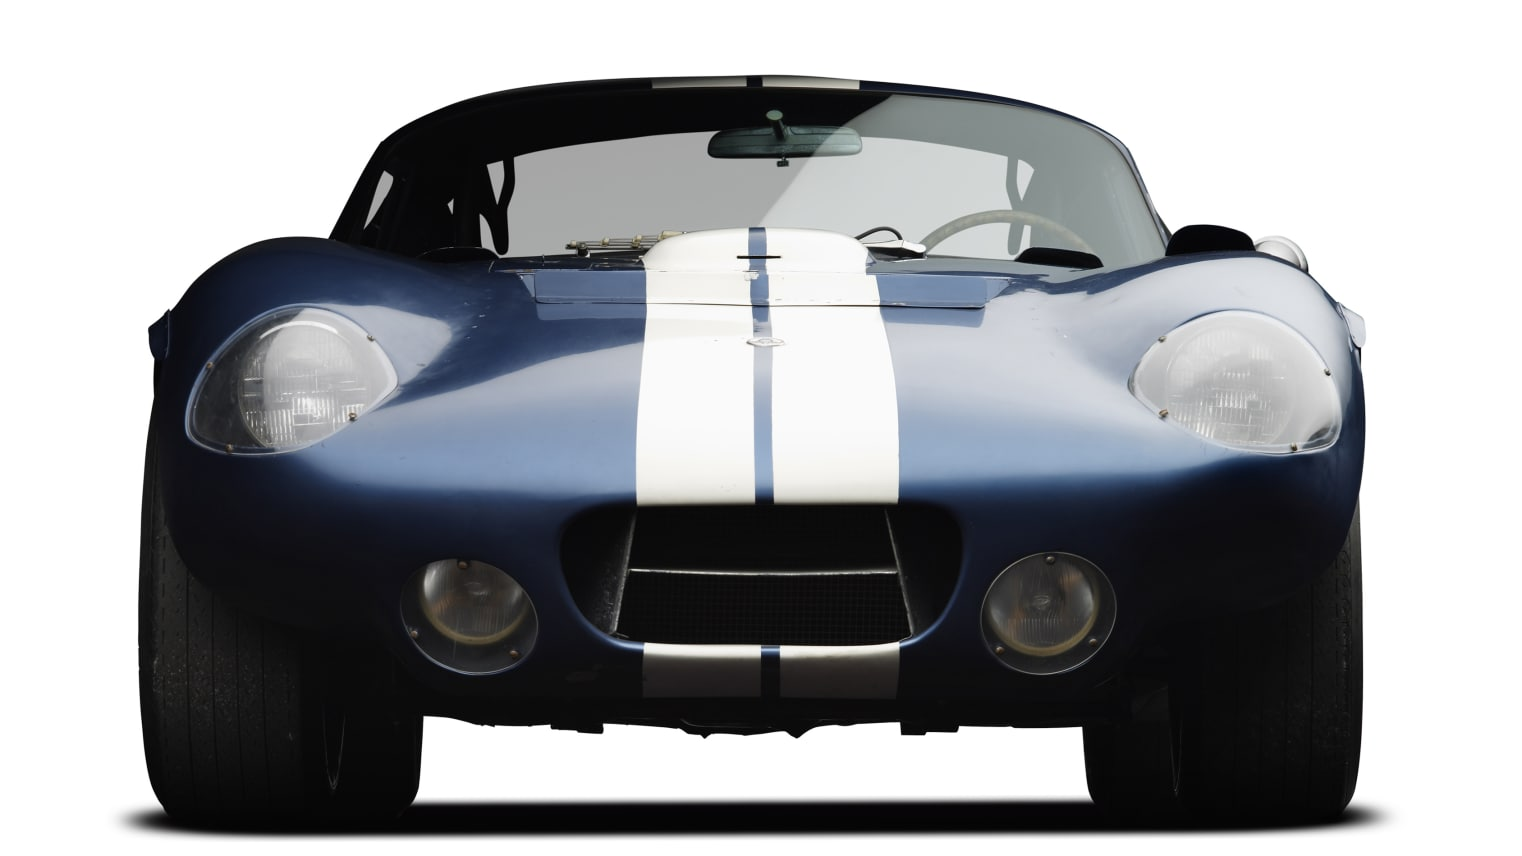 https://cruelery.com/uploads/157_1965-shelby-daytona-coupe-prototype-front-e.jpg